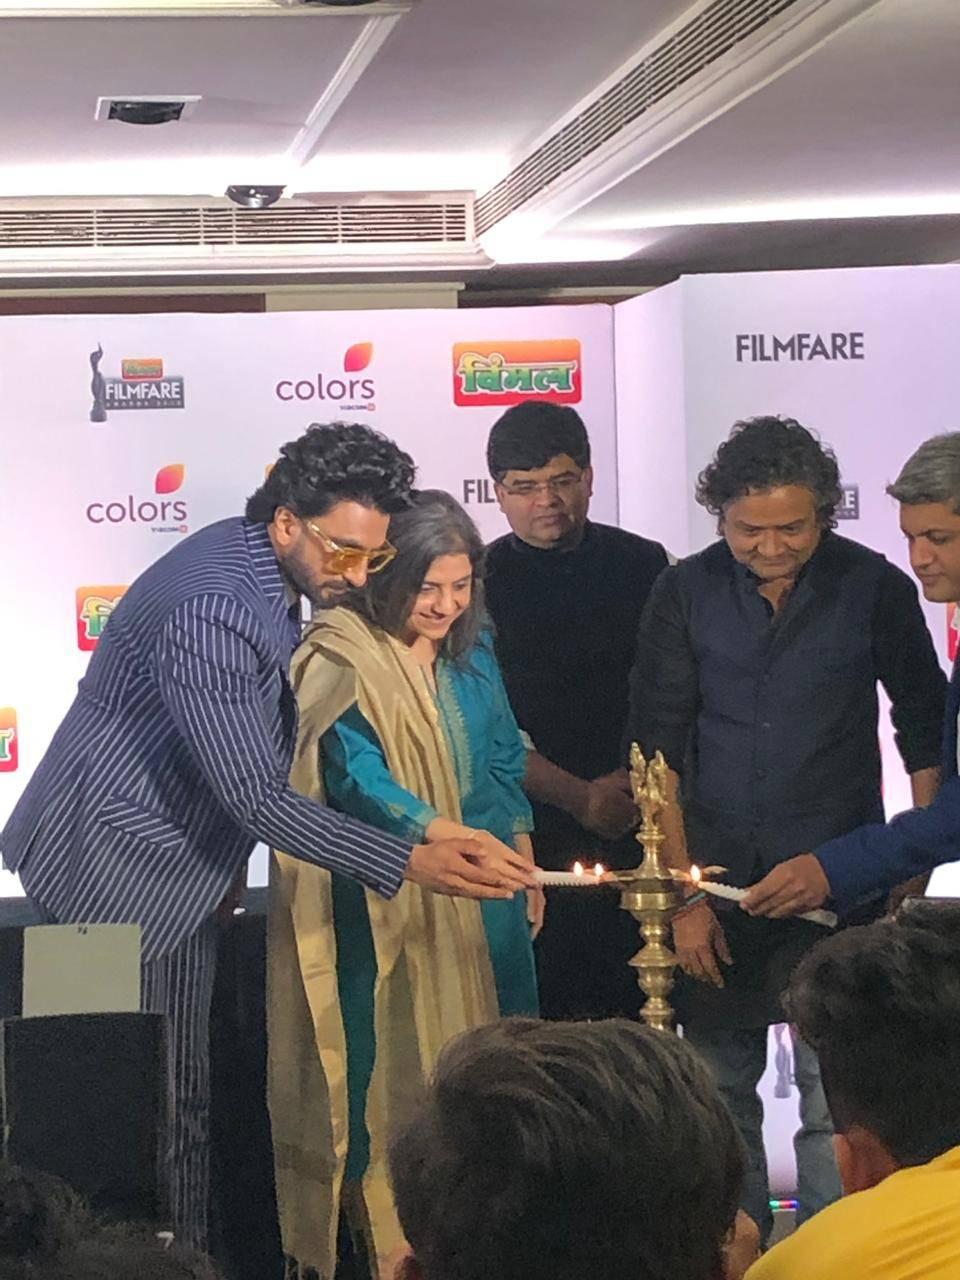 Filmfare 2019 (7).